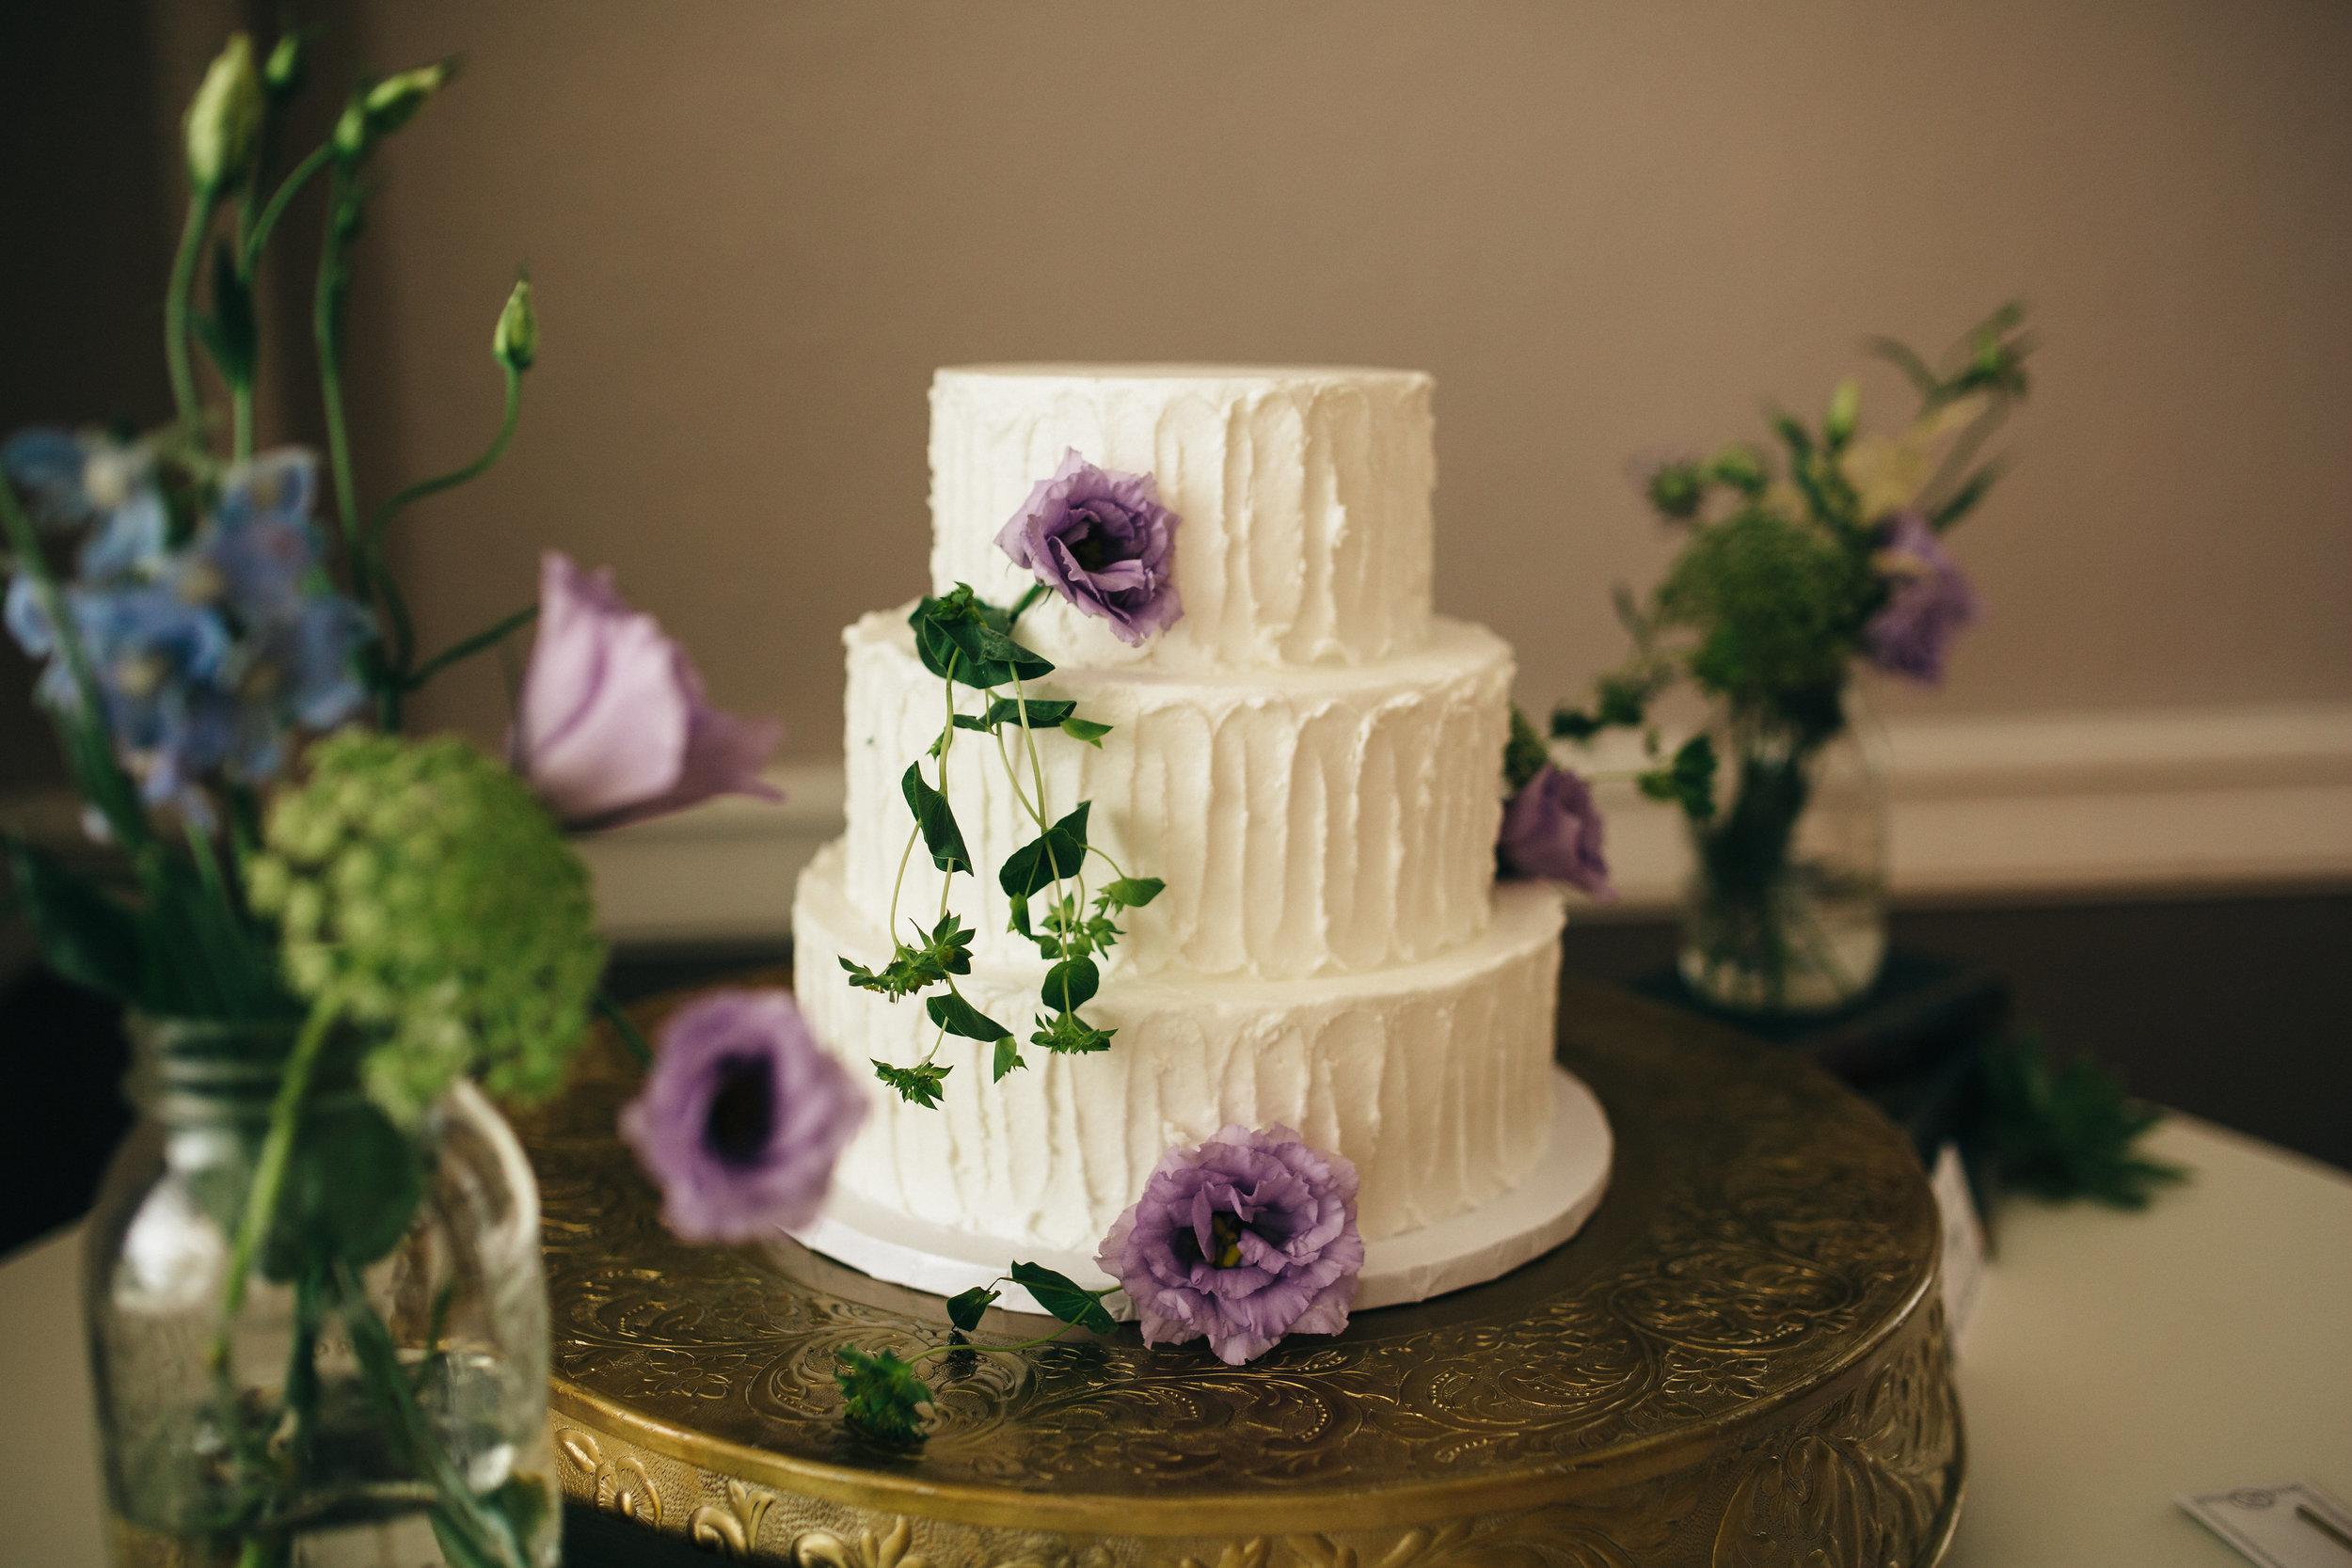 Eston's Wedding Cake with floral from La Boutique Nostalgie.